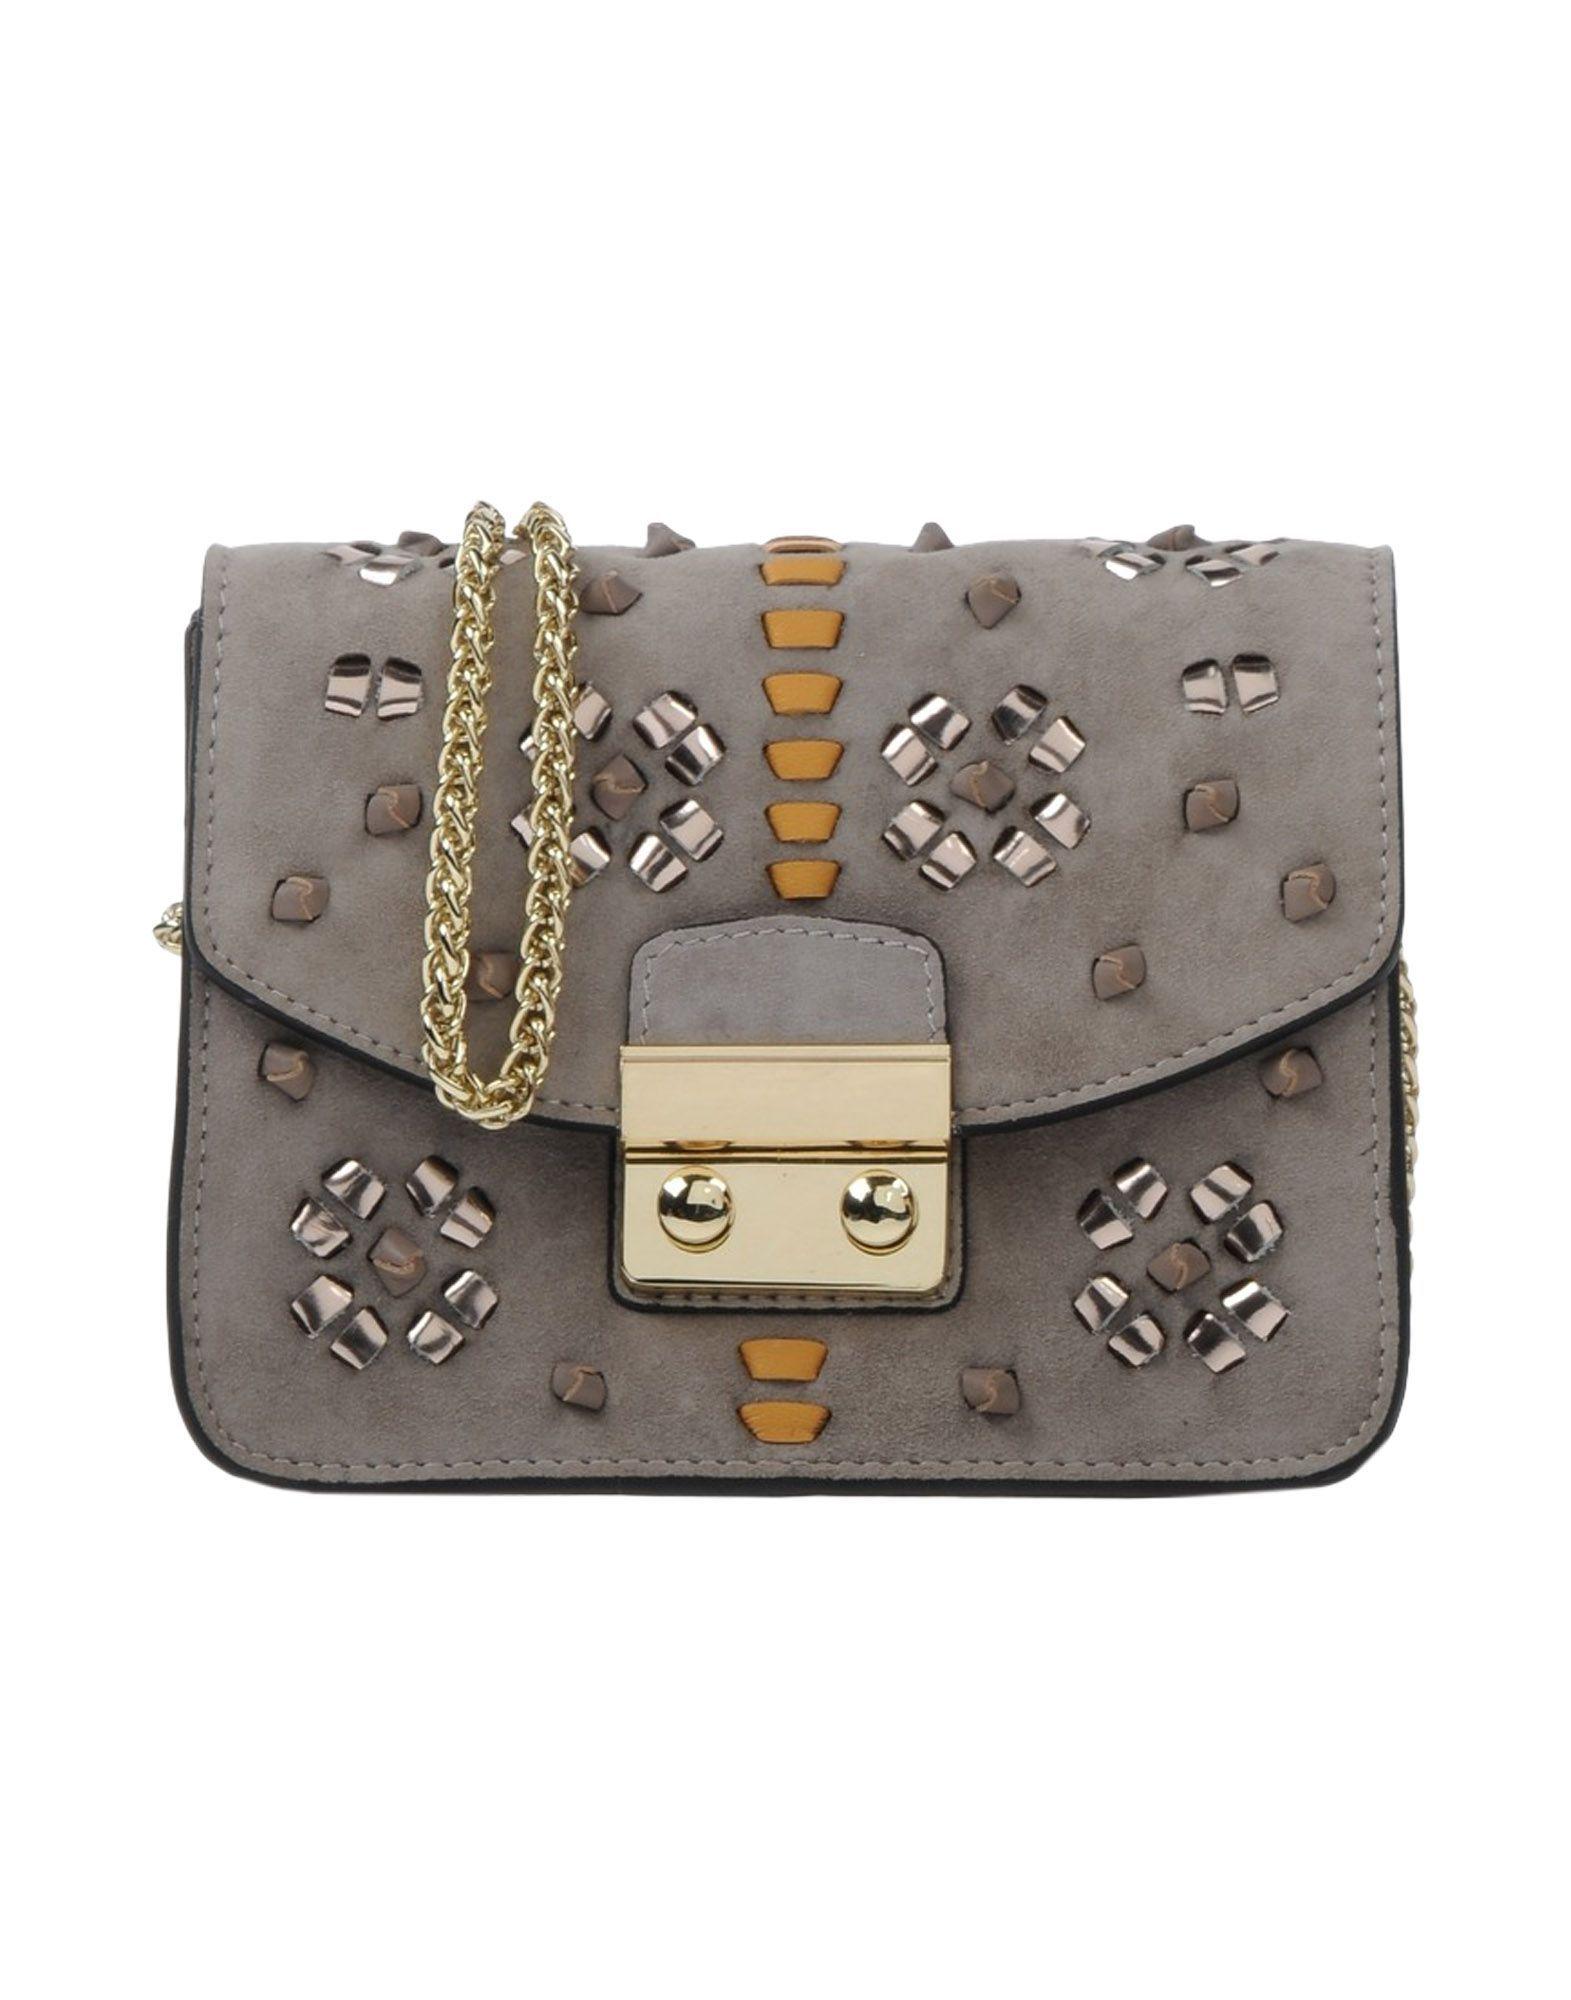 Lola bags Cruz Bags lolacruz shoulder hand metallic rPrO1qaW